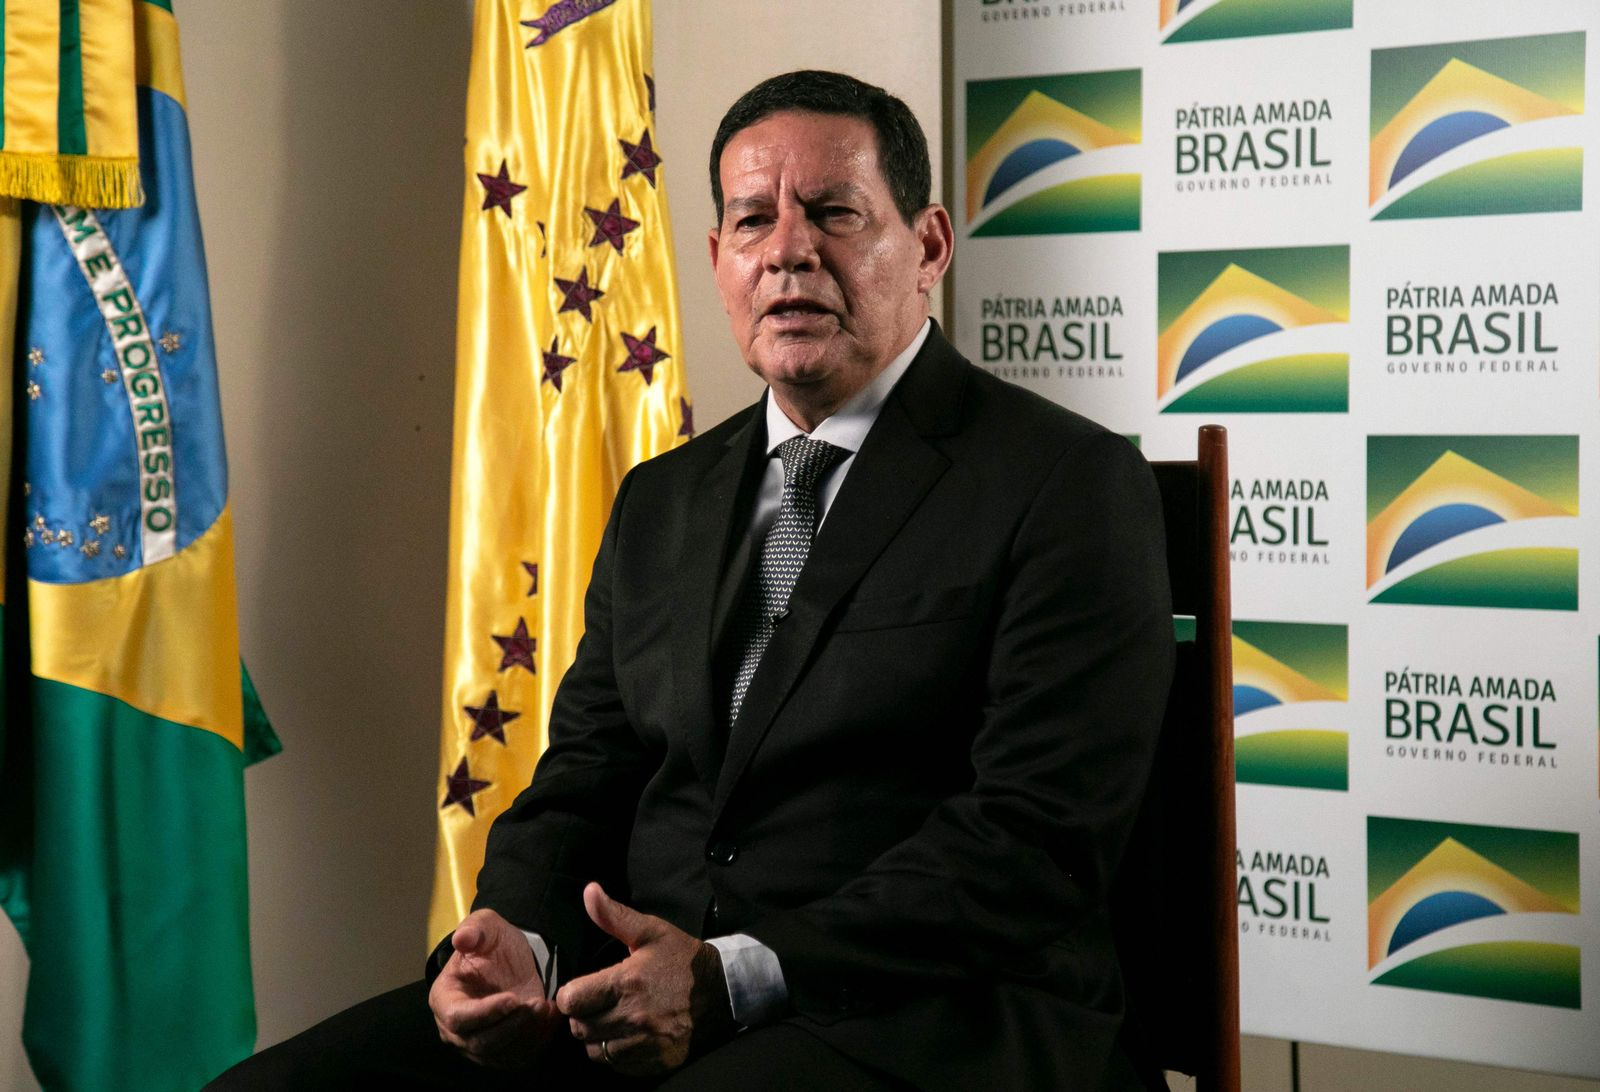 BRAZIL-MOURAO-INTERVIEW